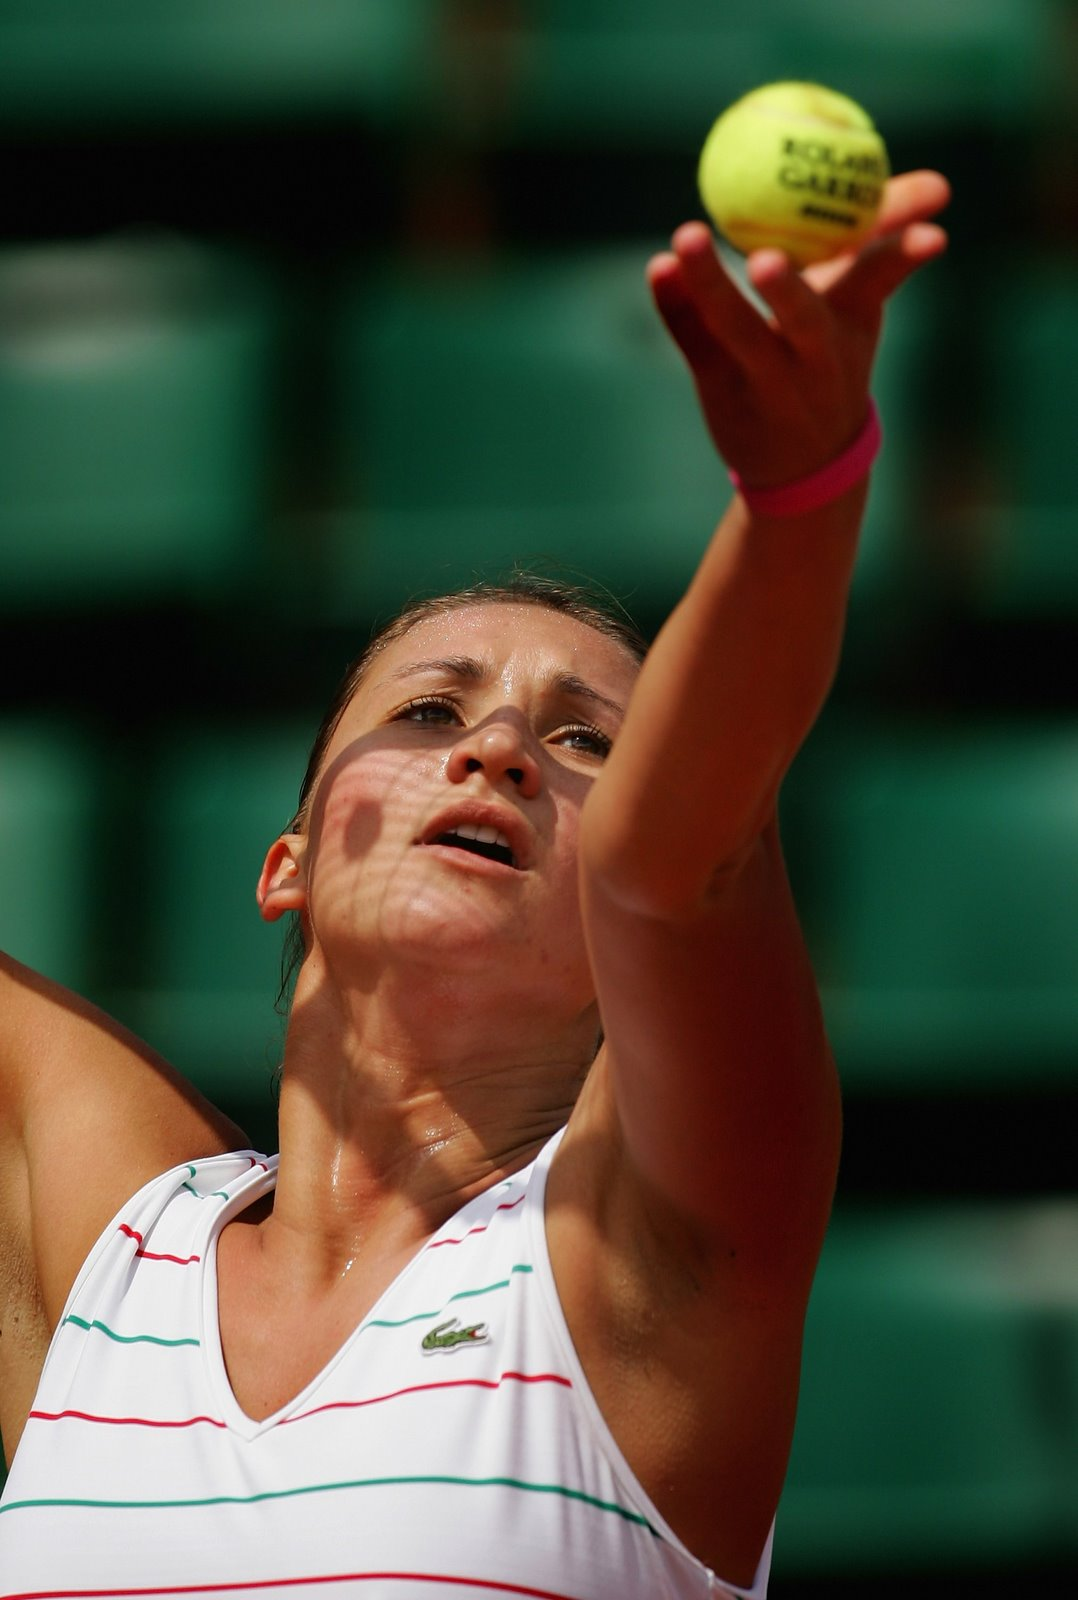 http://4.bp.blogspot.com/_VO55IT-lb1I/S7srXw3bacI/AAAAAAAAAig/oiXnLoBsxY0/s1600/Tatiana_Golovin_Tennis.jpg